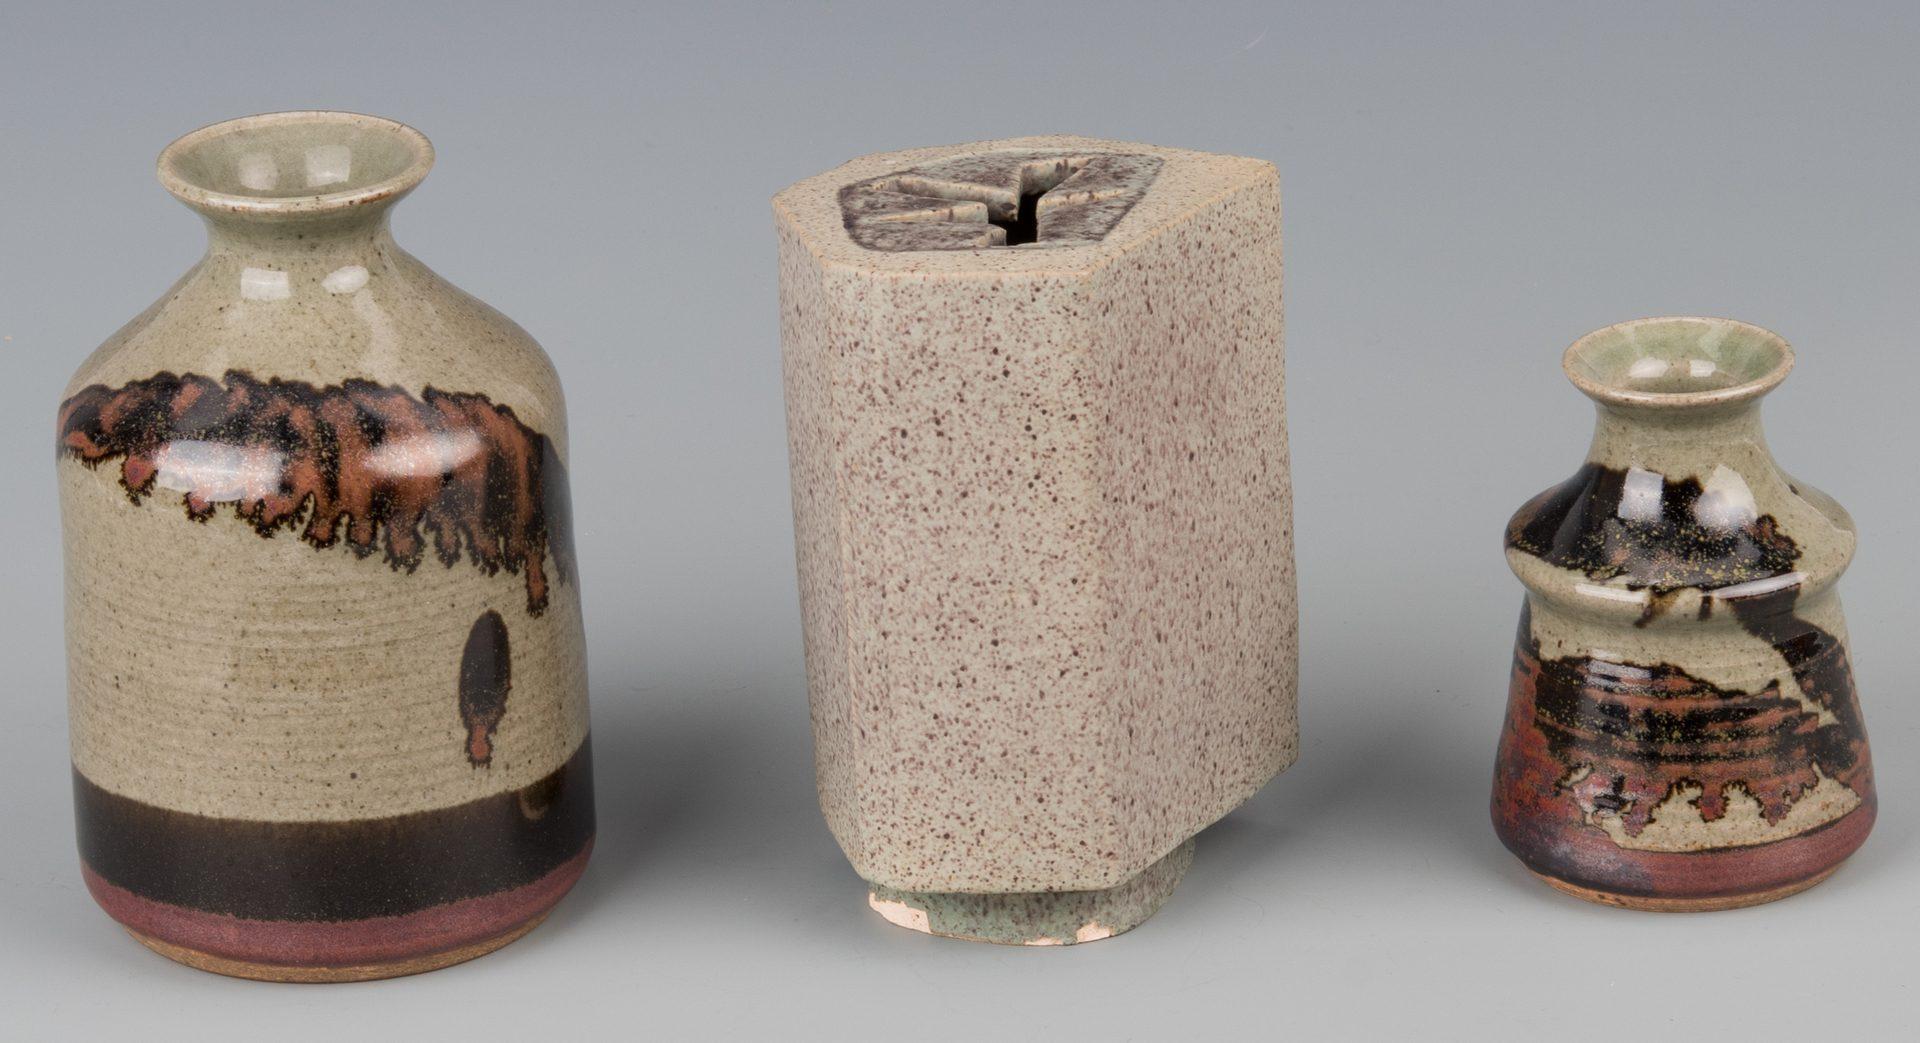 Lot 409: 5 Sylvia Hyman Ceramic Items